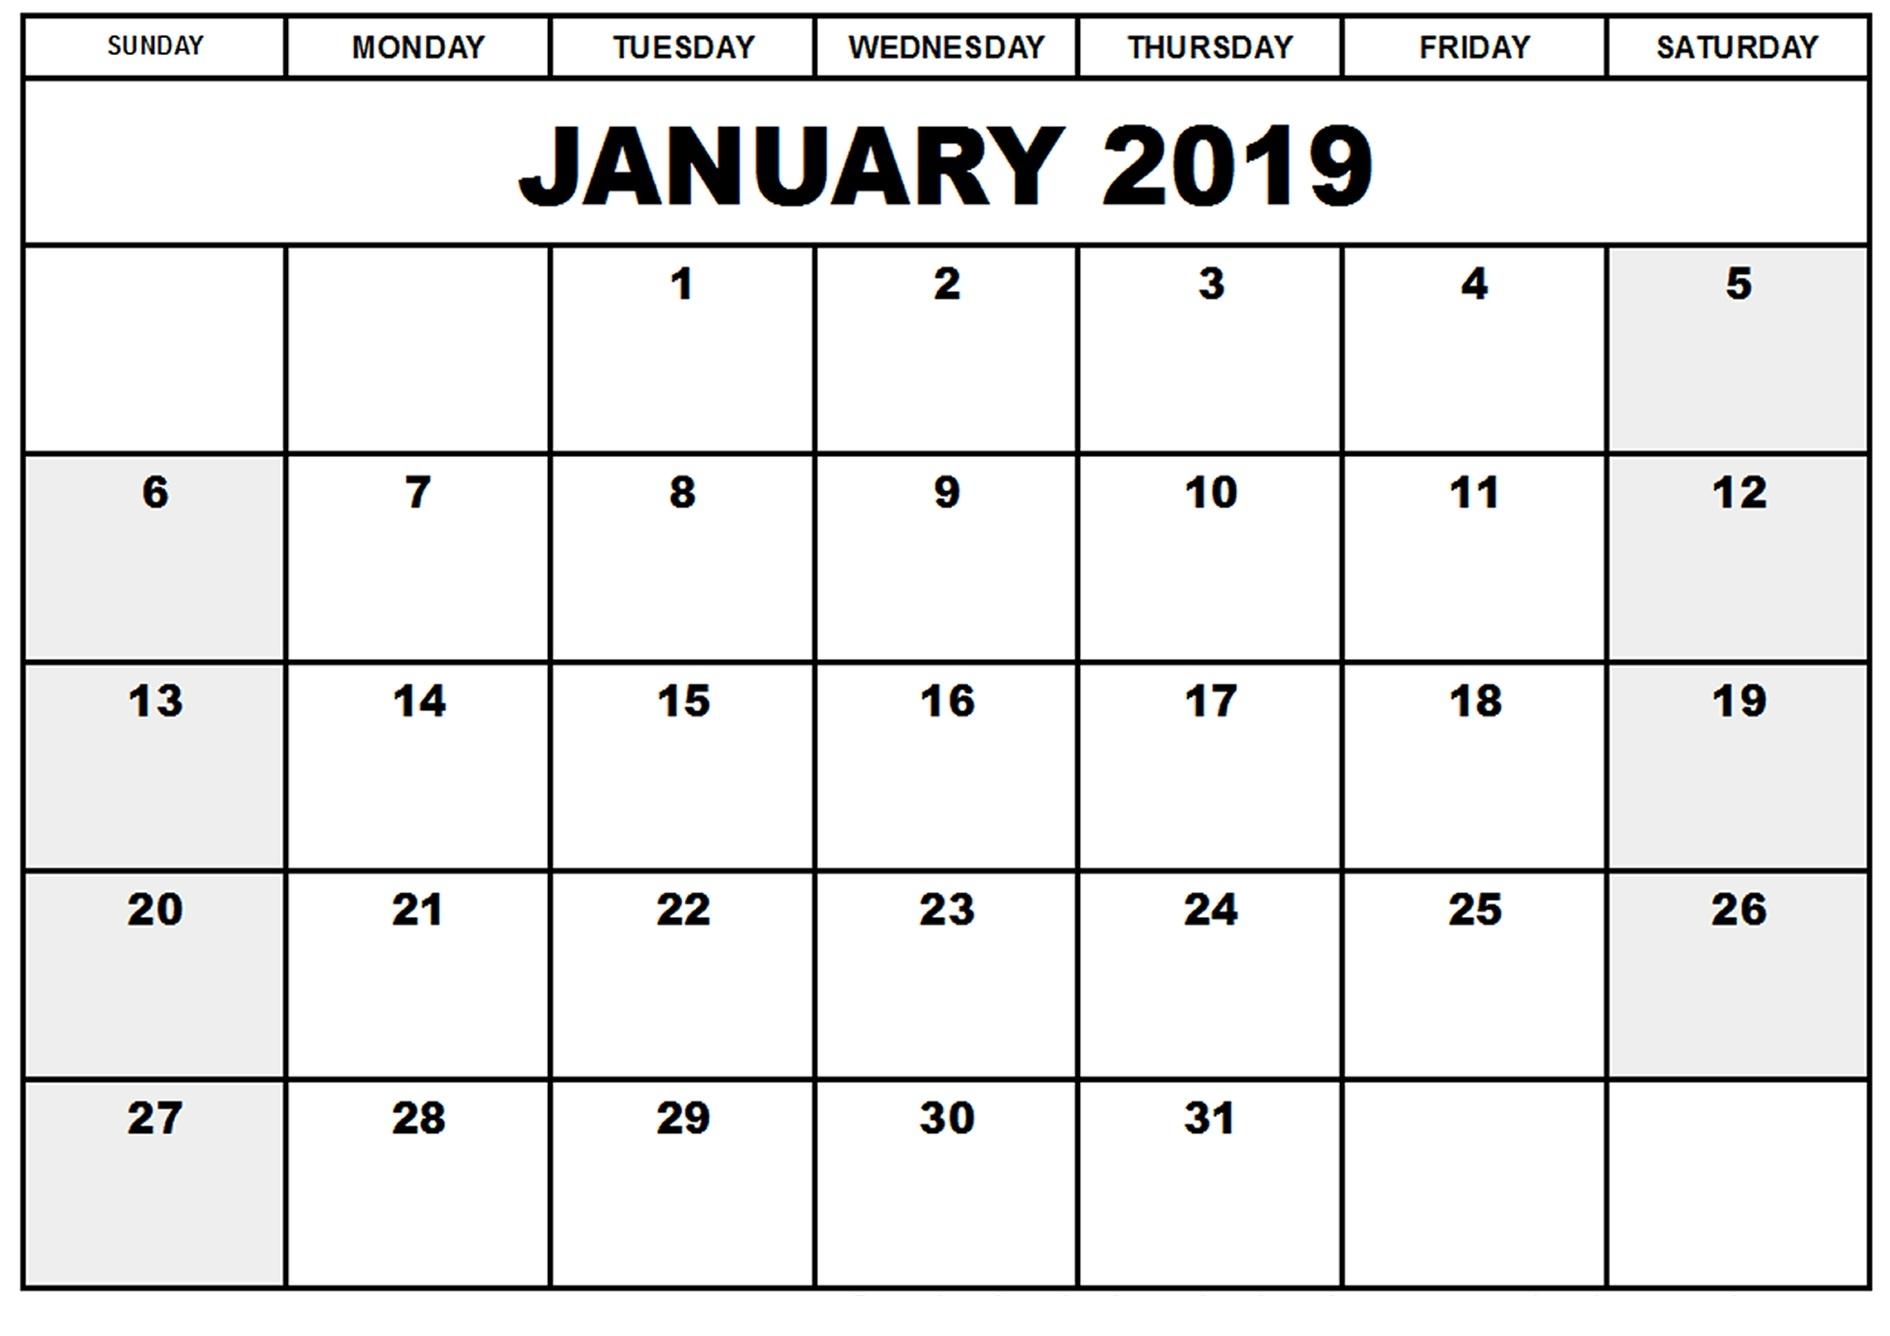 January 2019 Calendar Excel